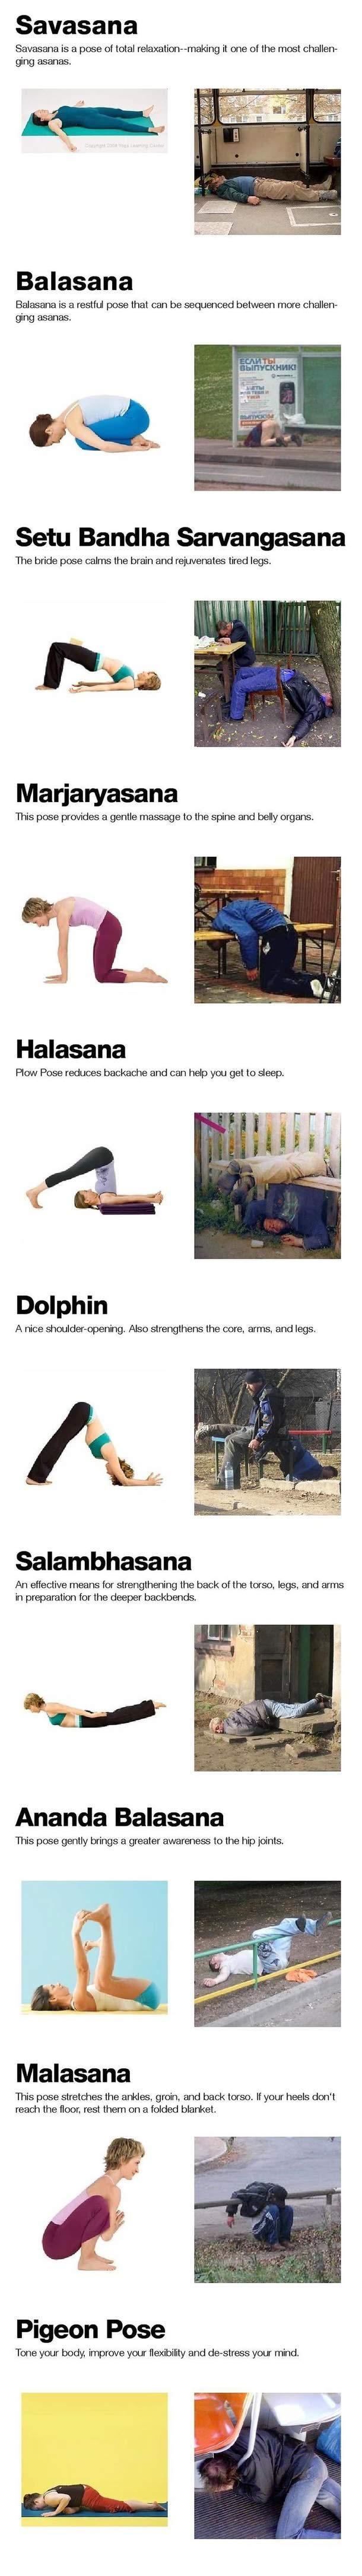 Nowy sposób na yoge :D